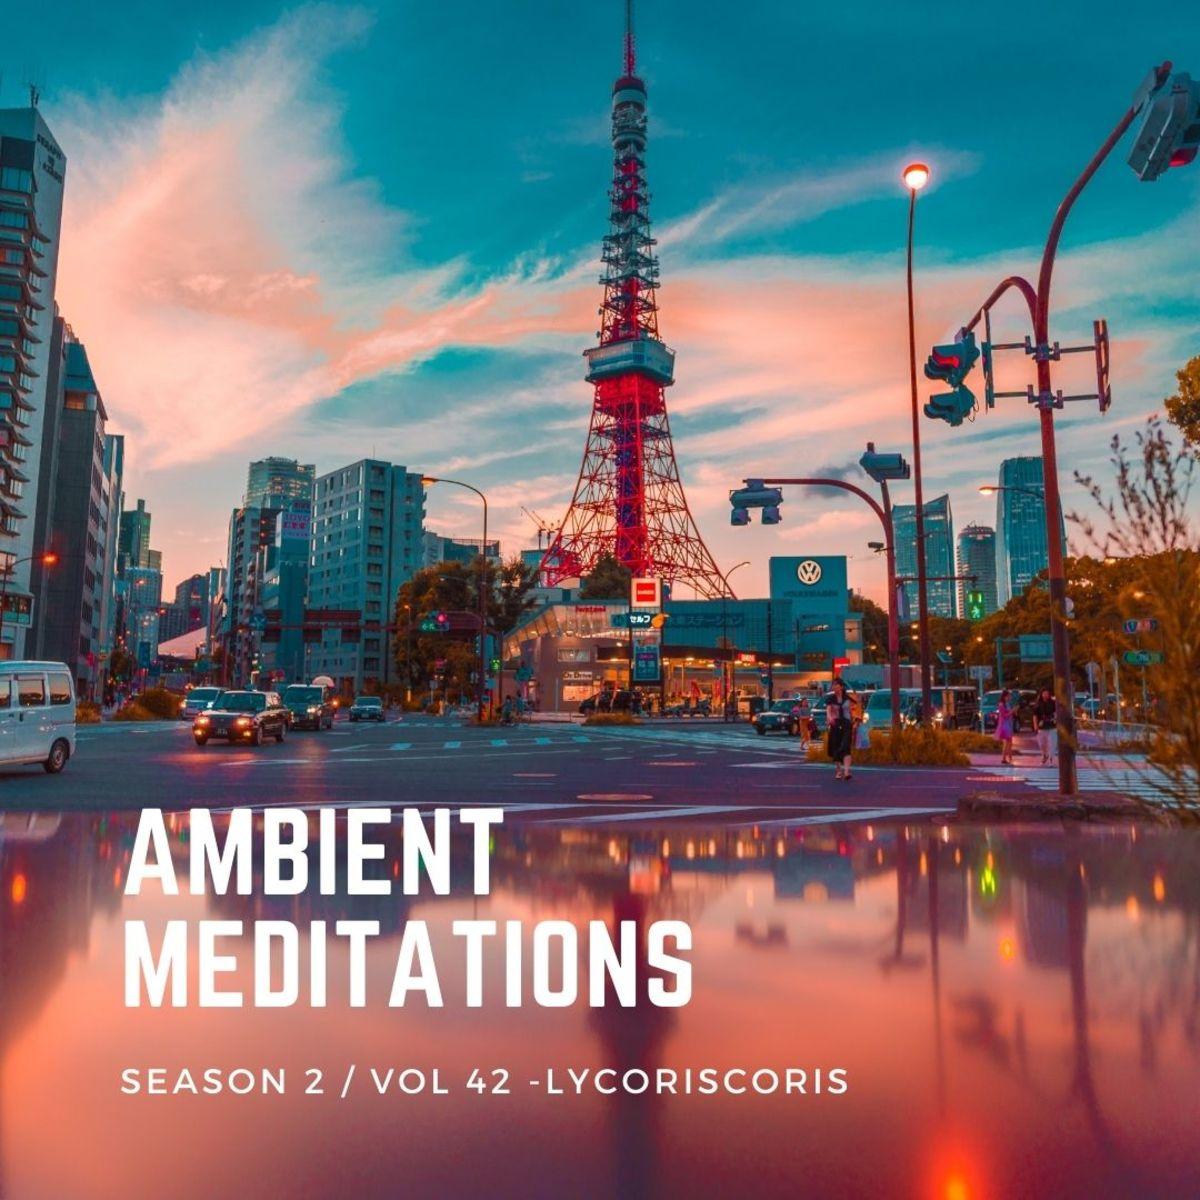 Ambient Meditations Season 2 - Vol 42 - Lycoriscoris